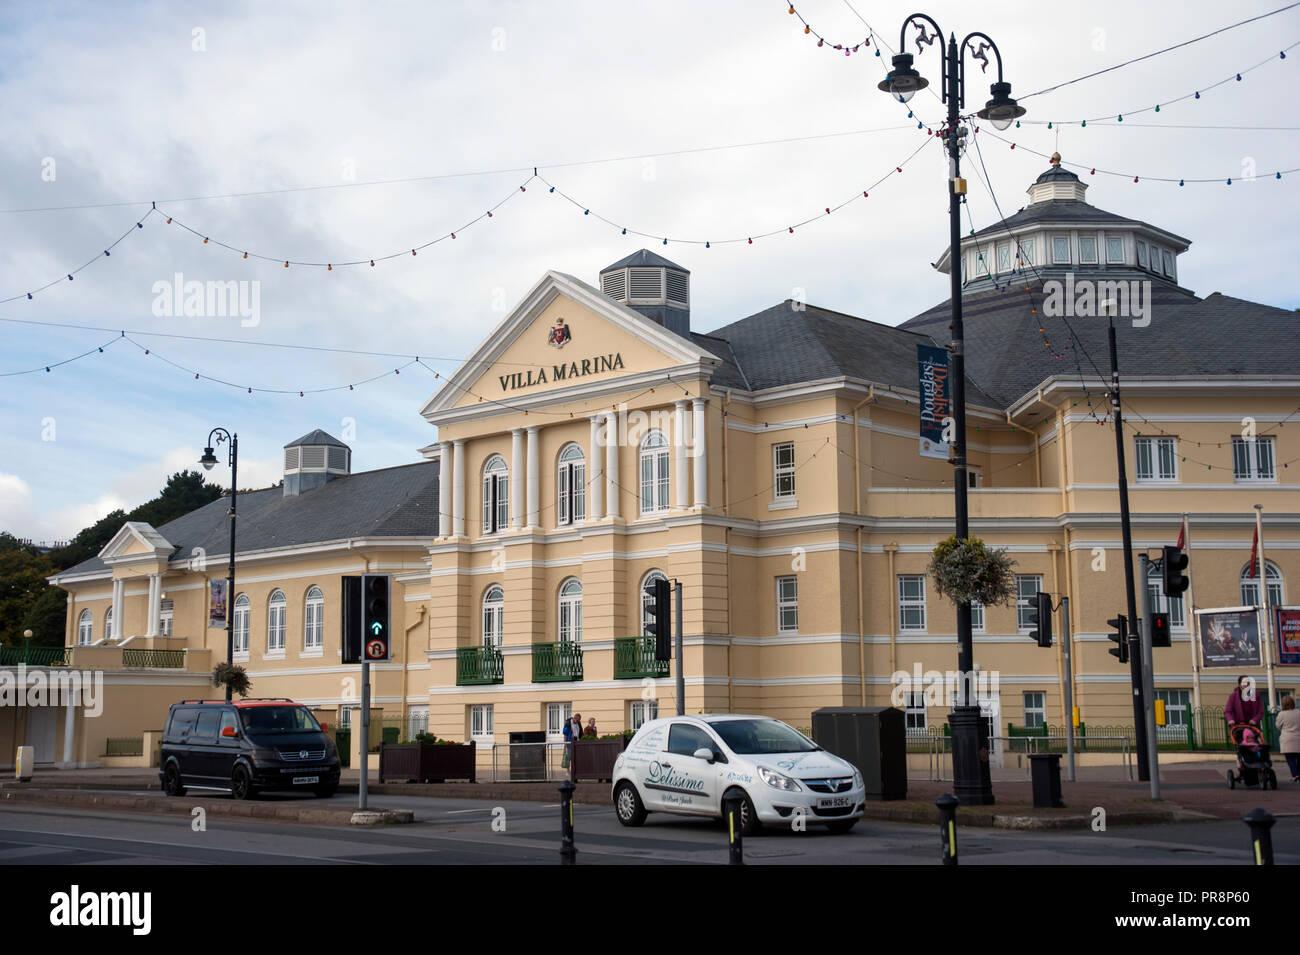 Villa Marina entertainment venue, Harris Promenade, Douglas,Isle of Man. - Stock Image